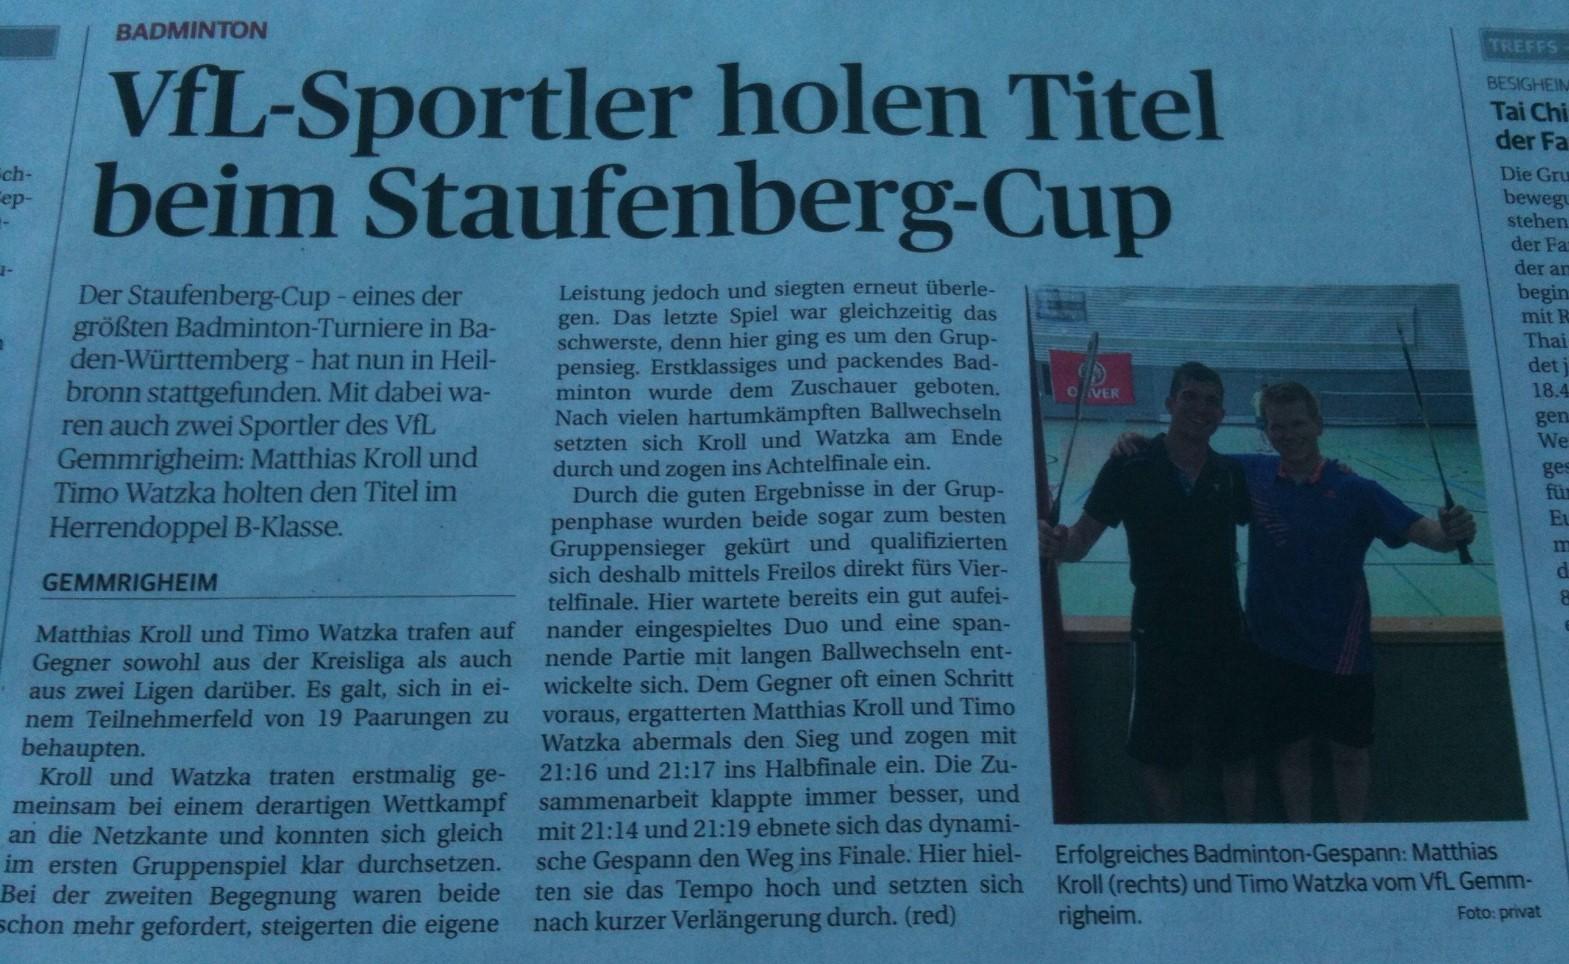 Bericht NEB zum Staufenberg-Cup Heilbronn 2015